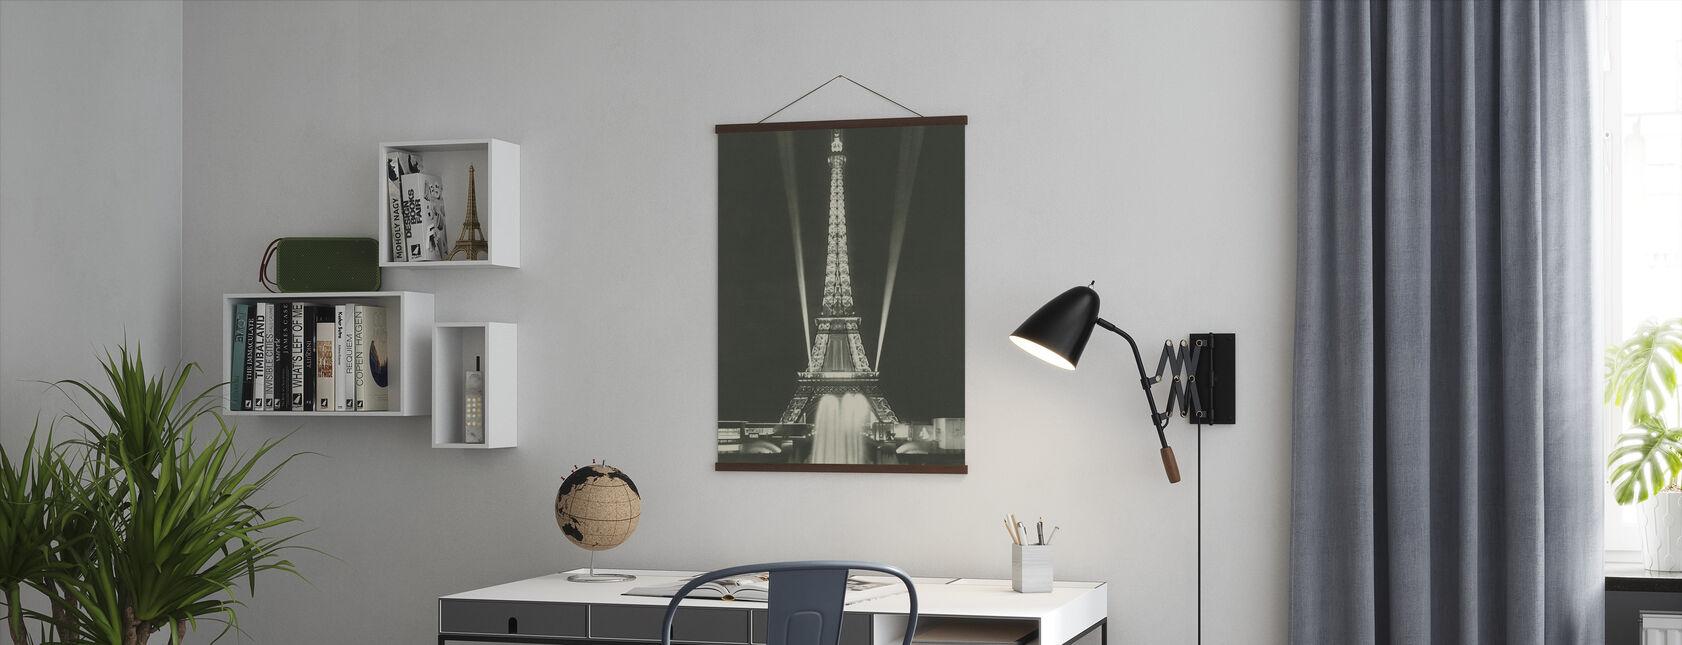 Eiffel Tower Lights - Poster - Office